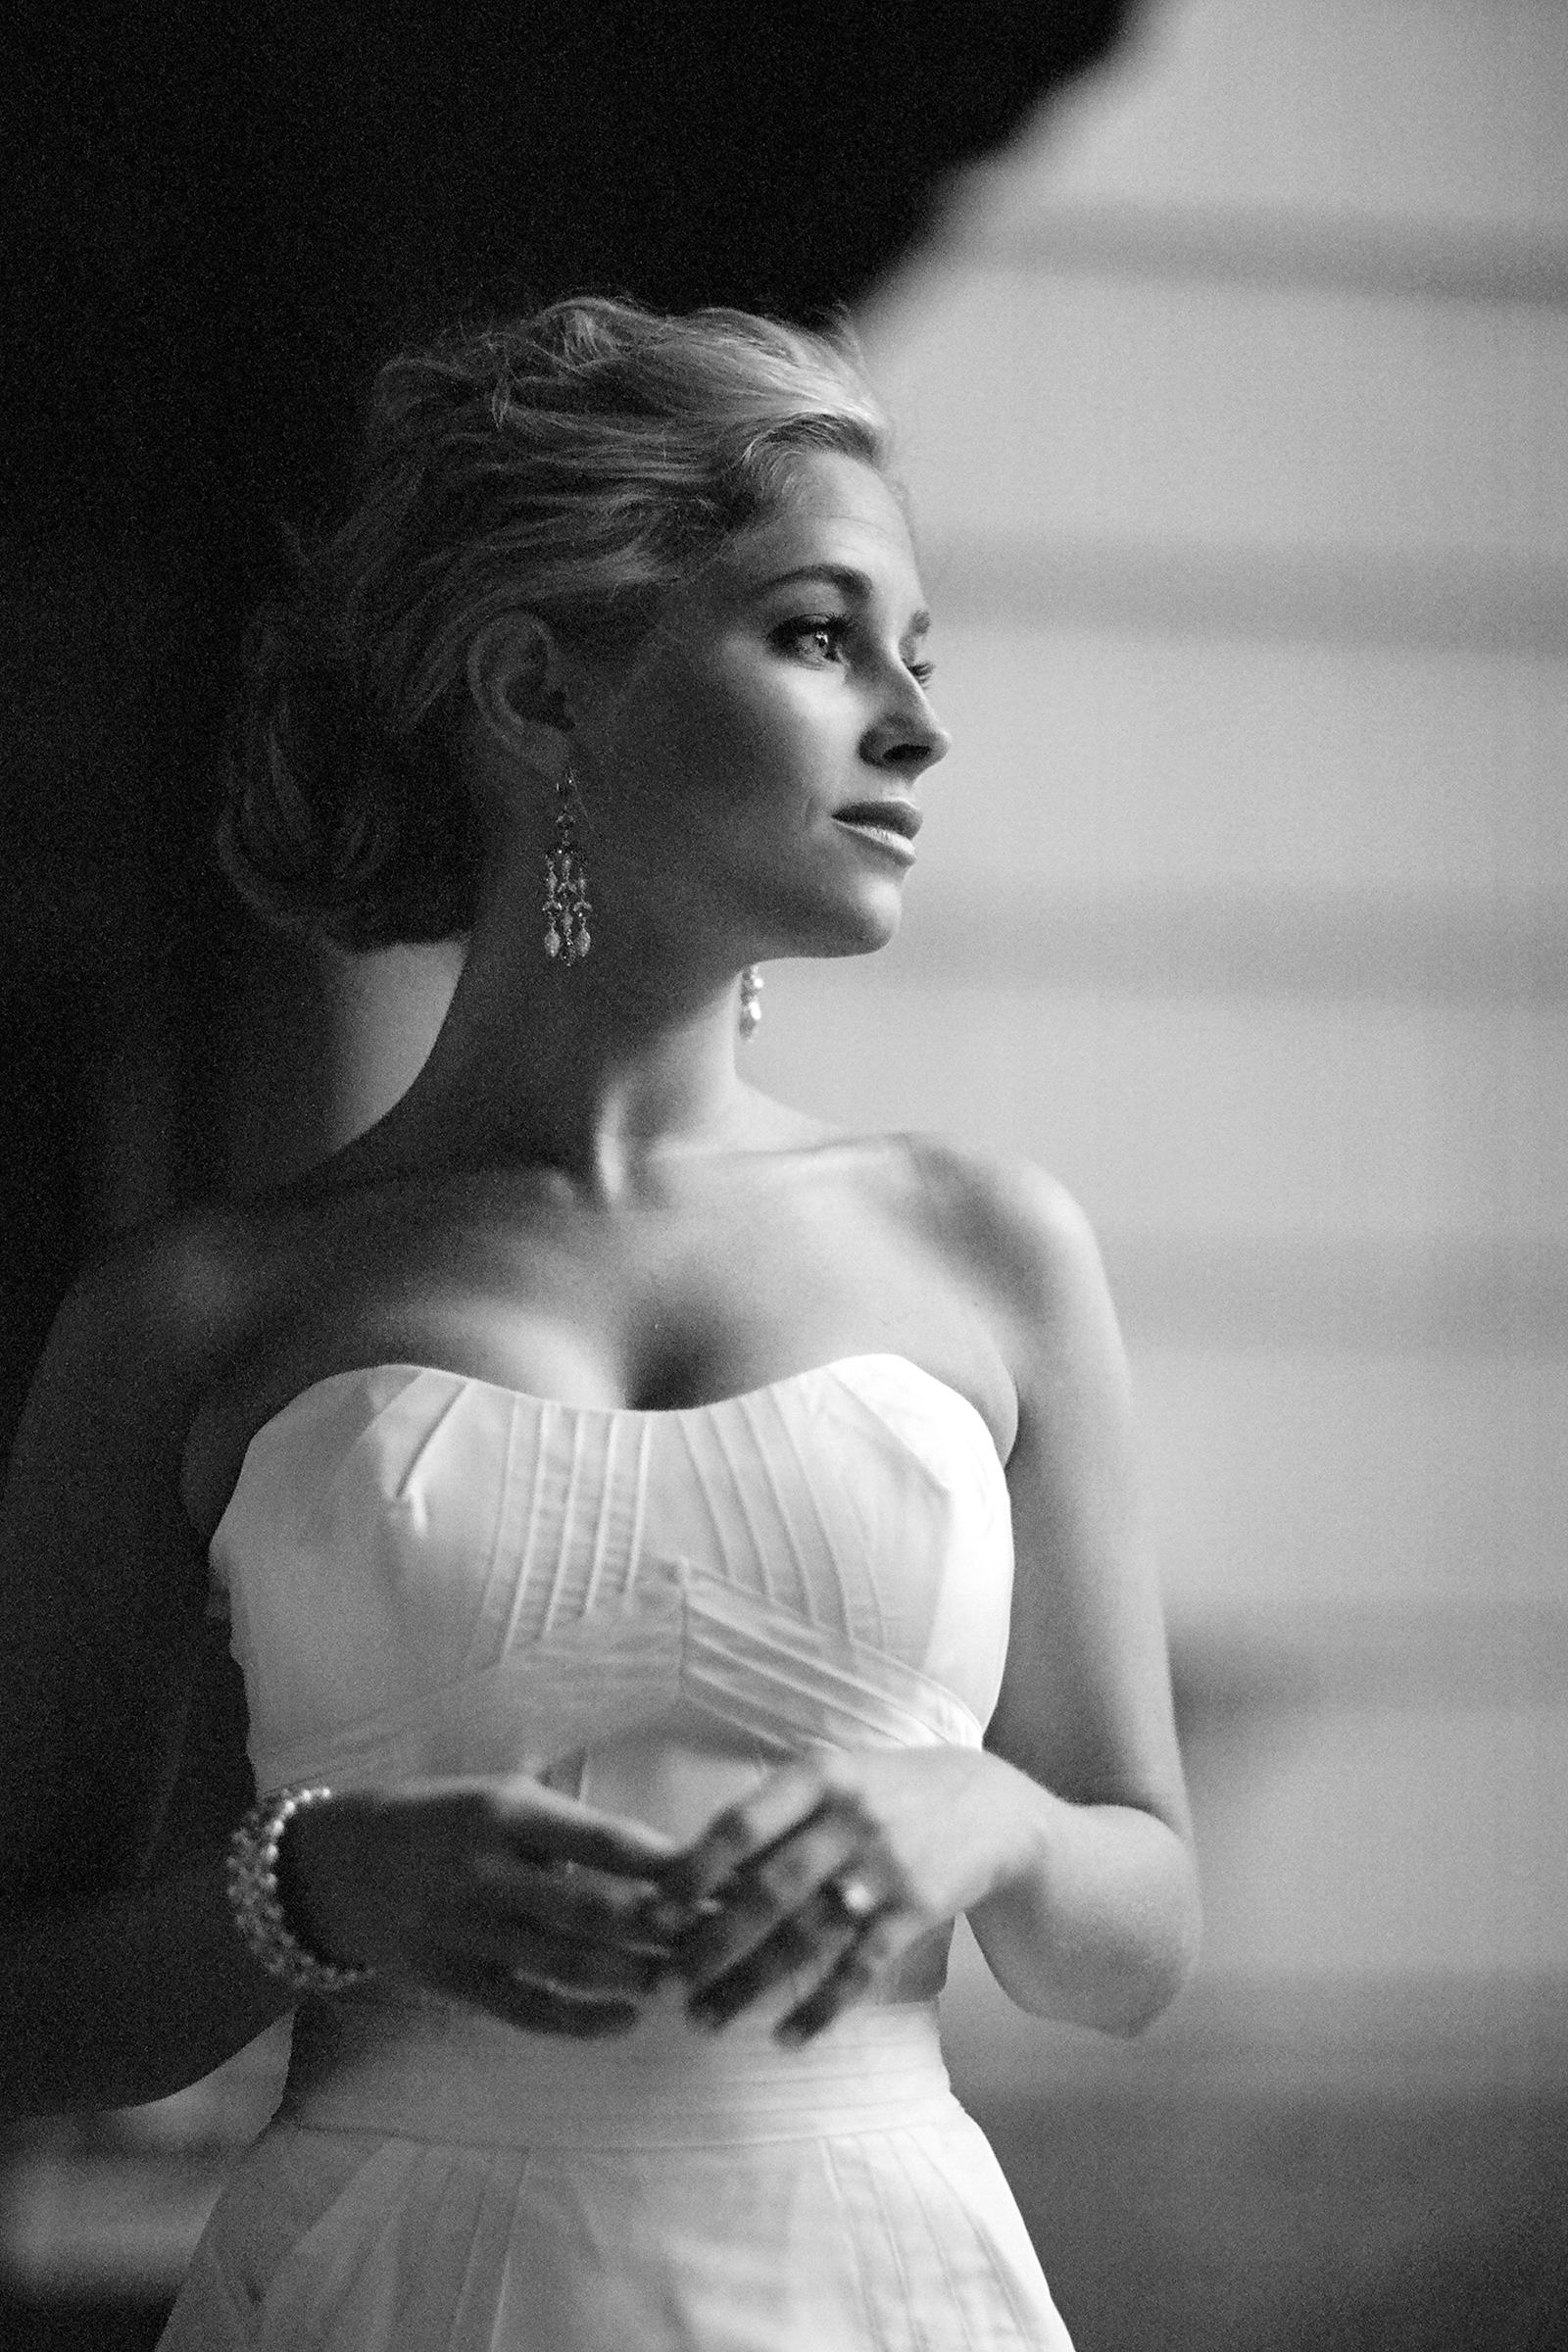 glamorous-bride-in-strapless-gown-bradley-hanson-photography